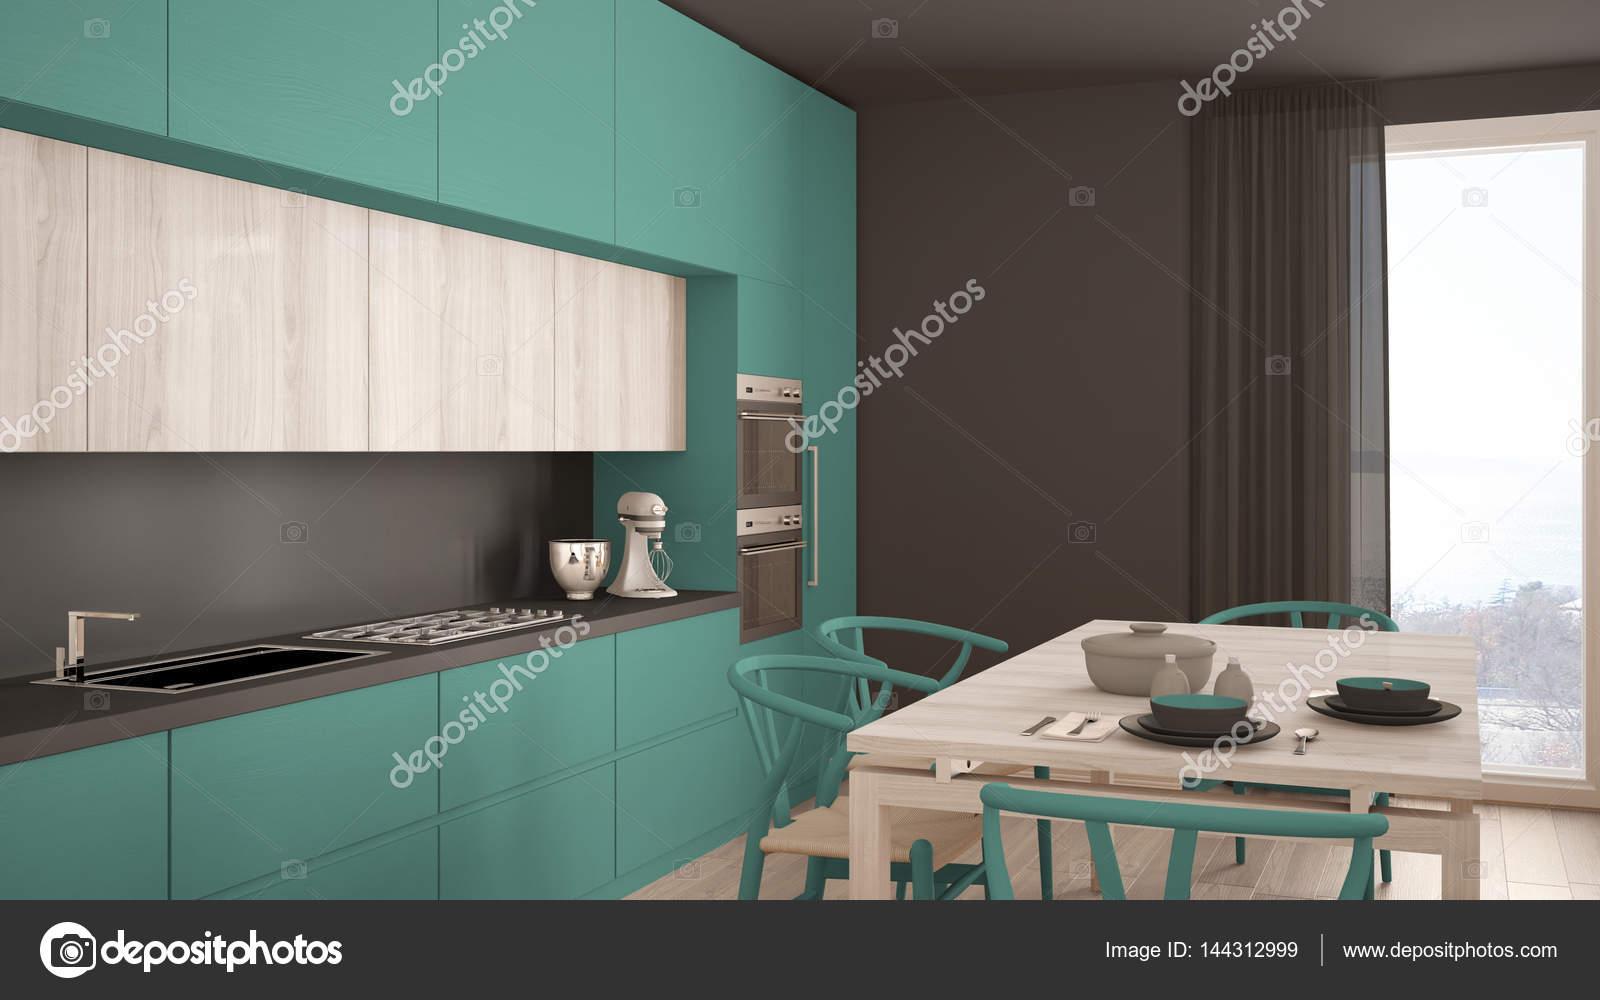 turquoise kitchen decor white floor 现代最小绿松石厨房用木地板 经典的界面 图库照片 c archiviz 144312999